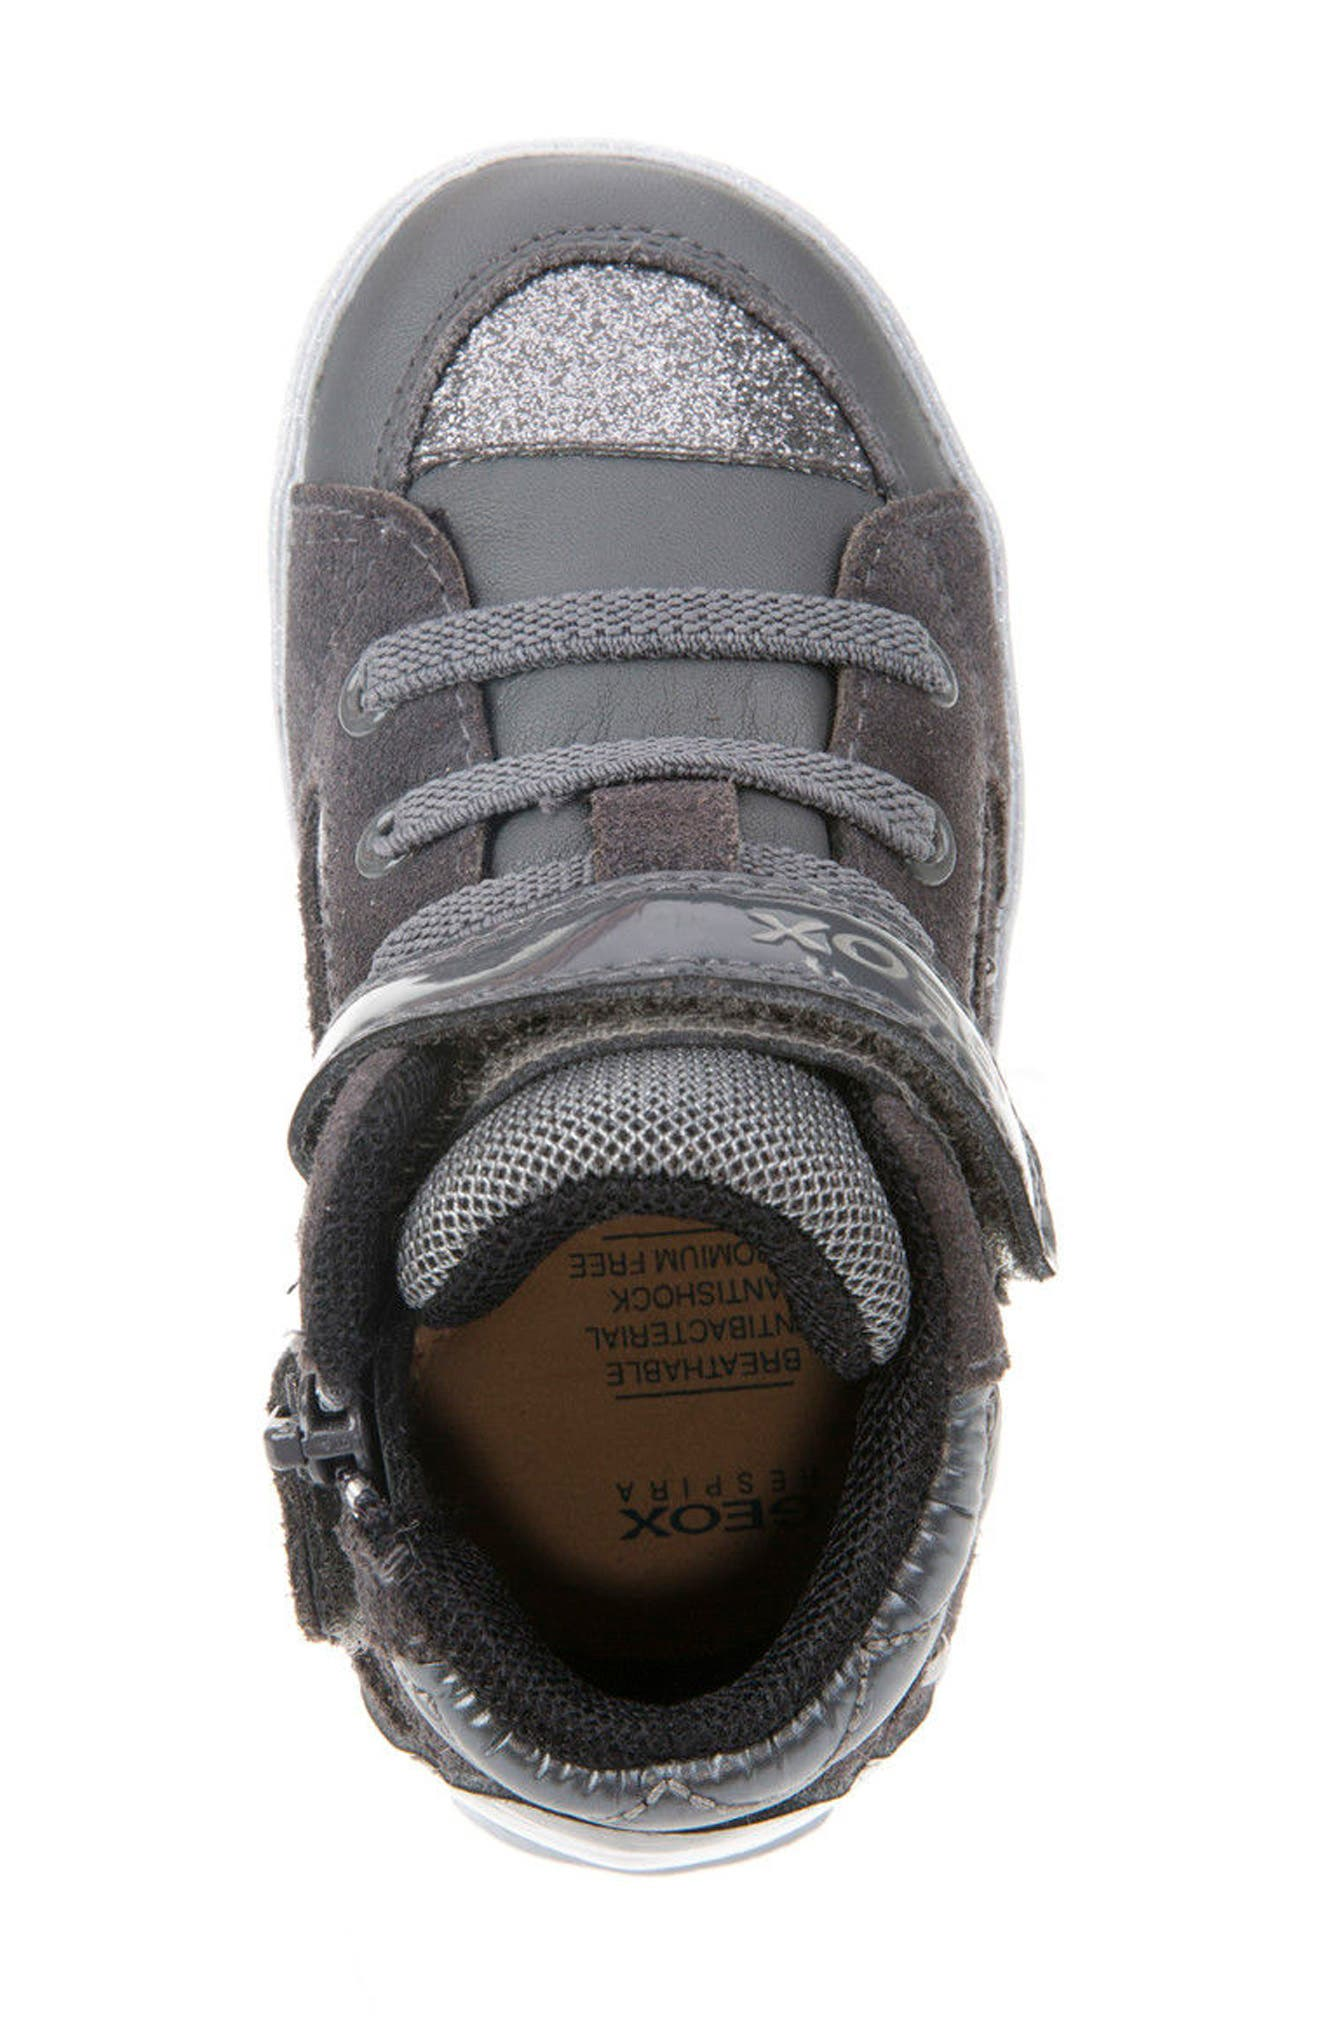 Kiwi Studded High Top Sneaker,                             Alternate thumbnail 5, color,                             020